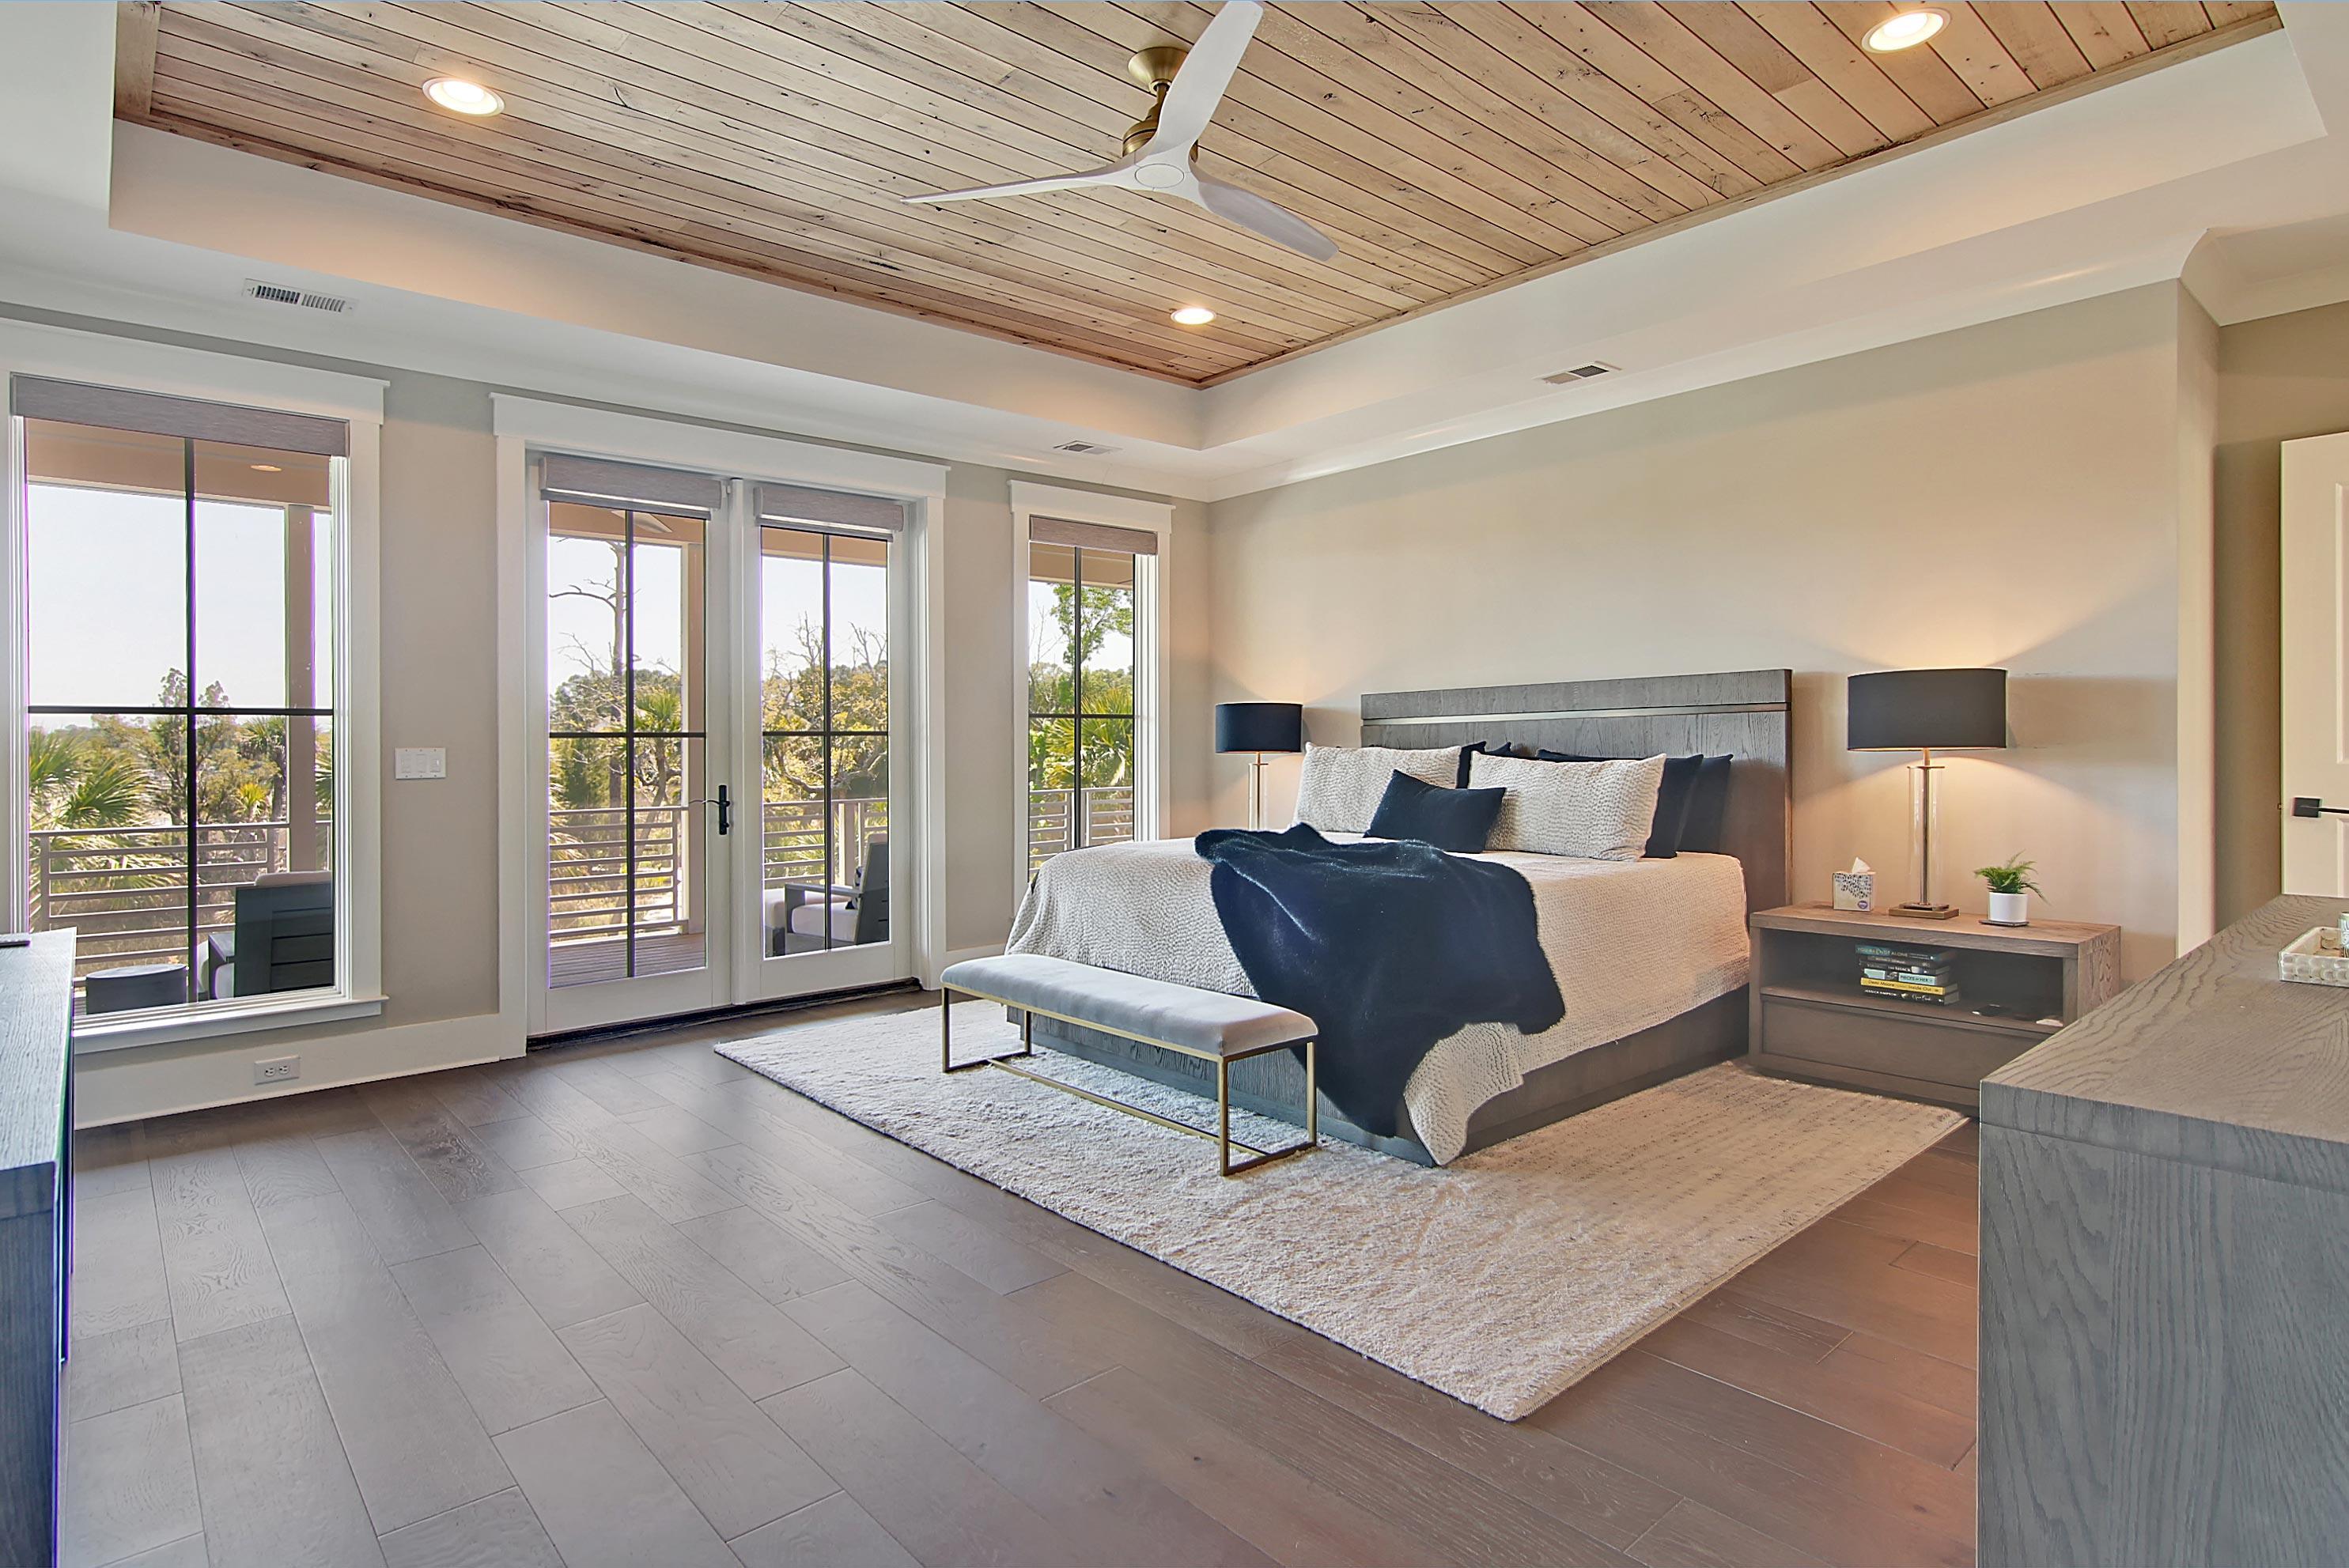 Dunes West Homes For Sale - 2456 Darts Cove, Mount Pleasant, SC - 42